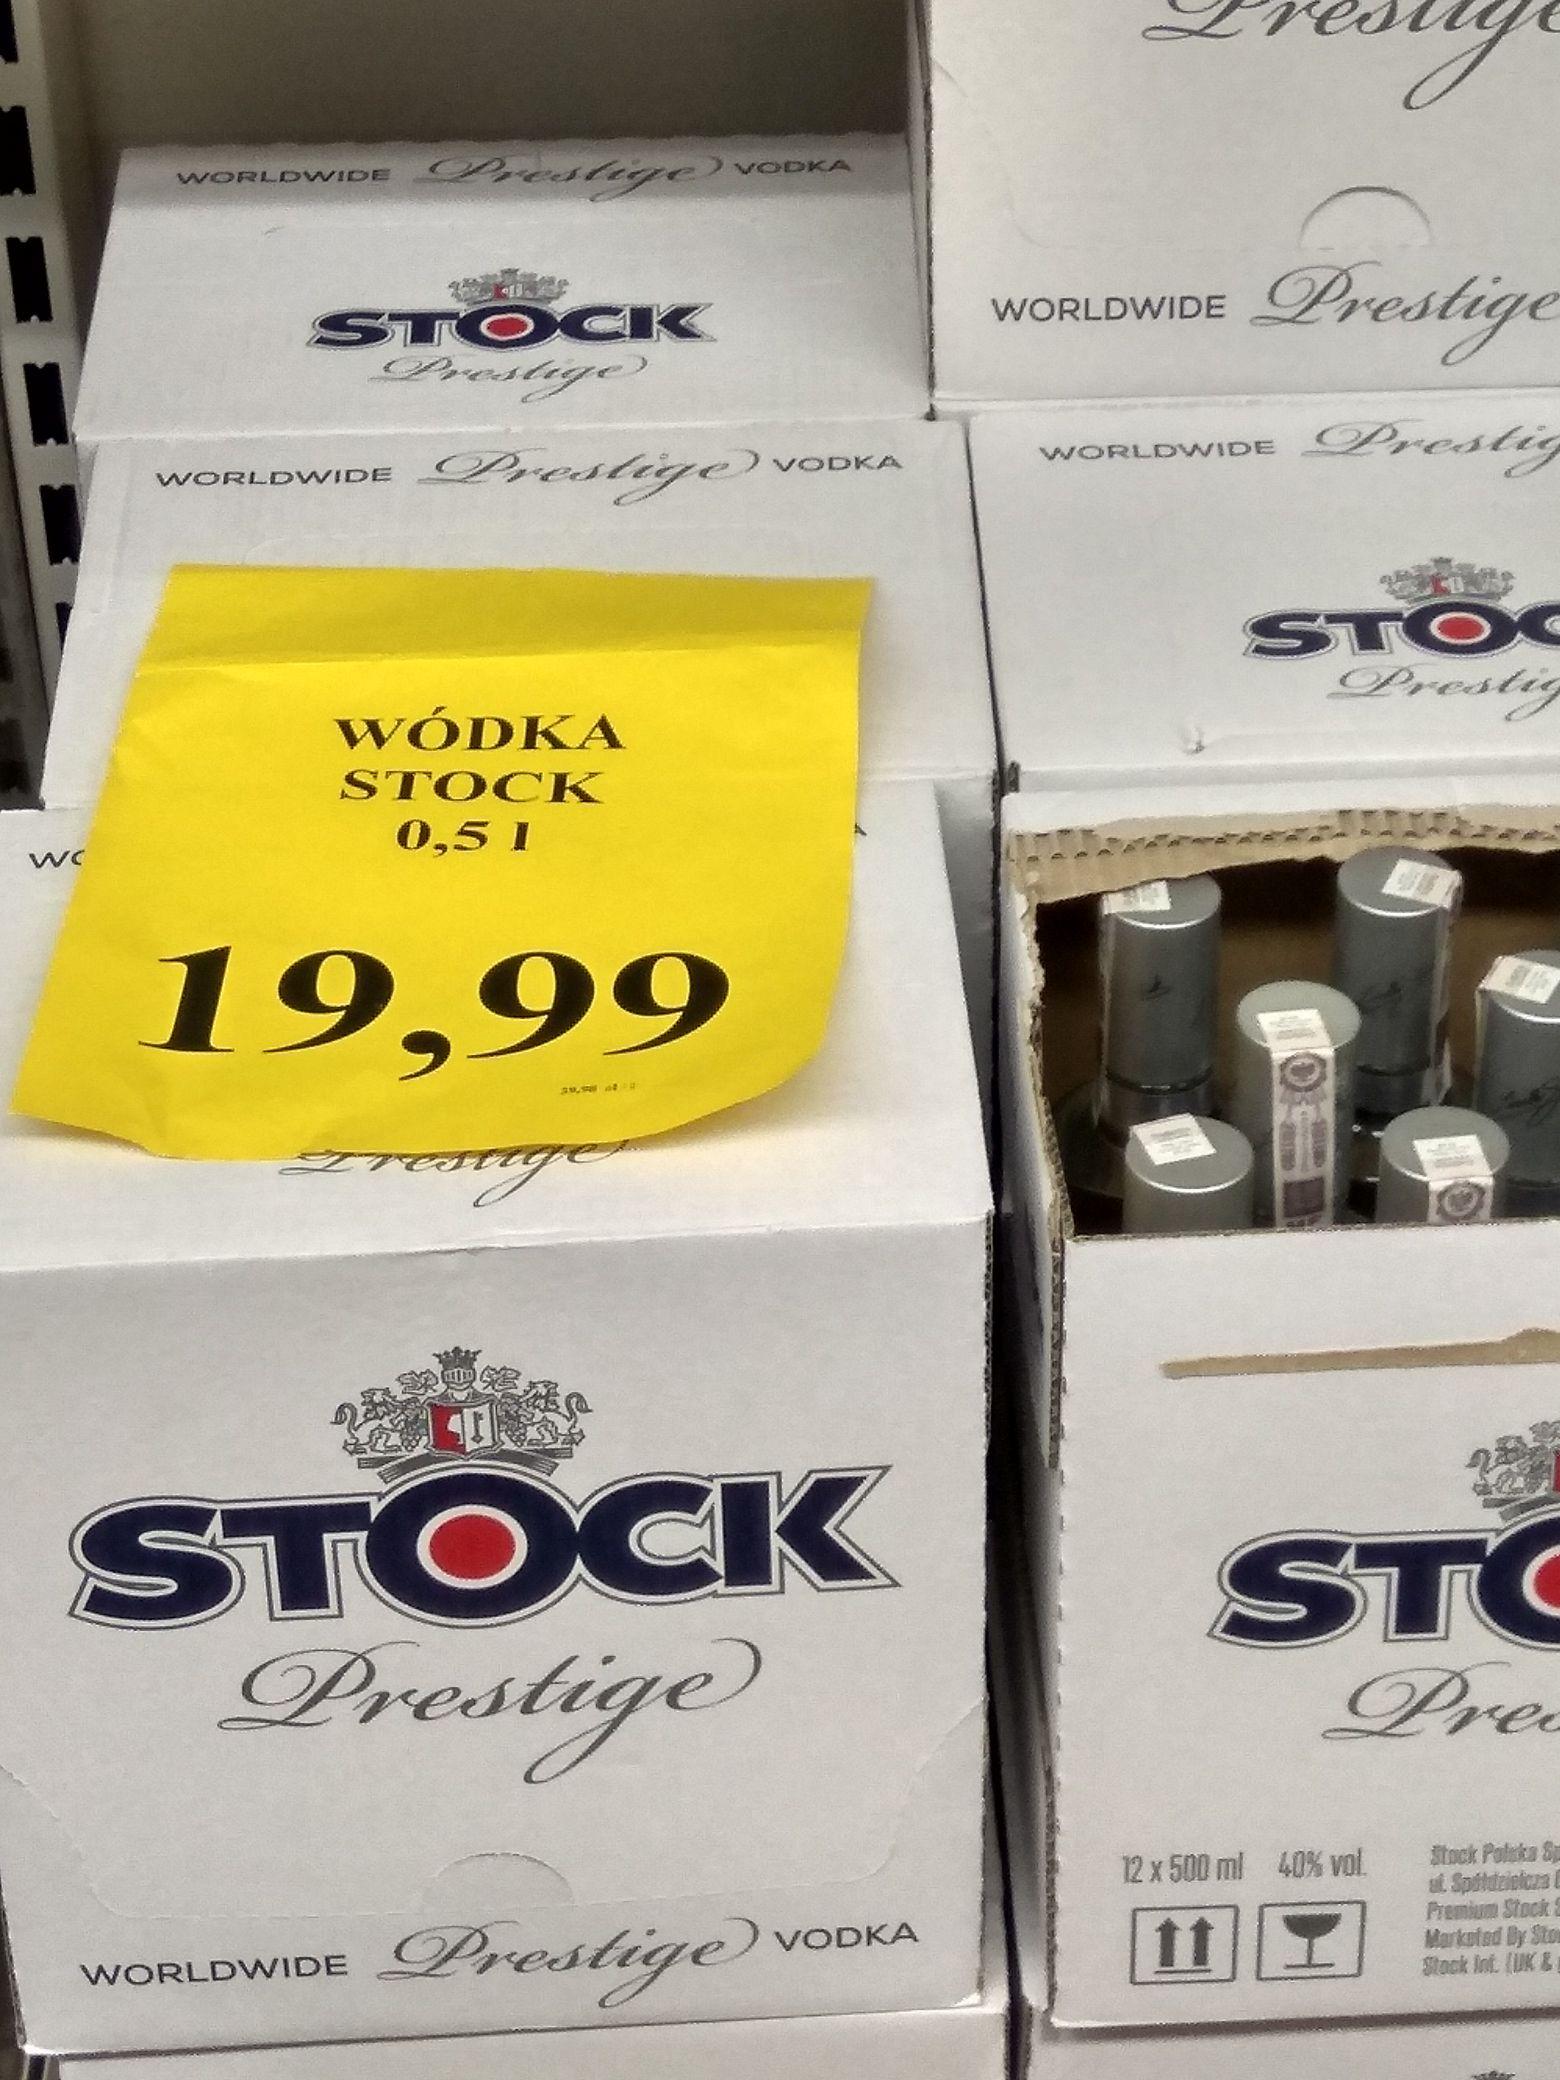 Wódka STOCK PRESTIGE 19.99 za 0.5L sklep Orzech